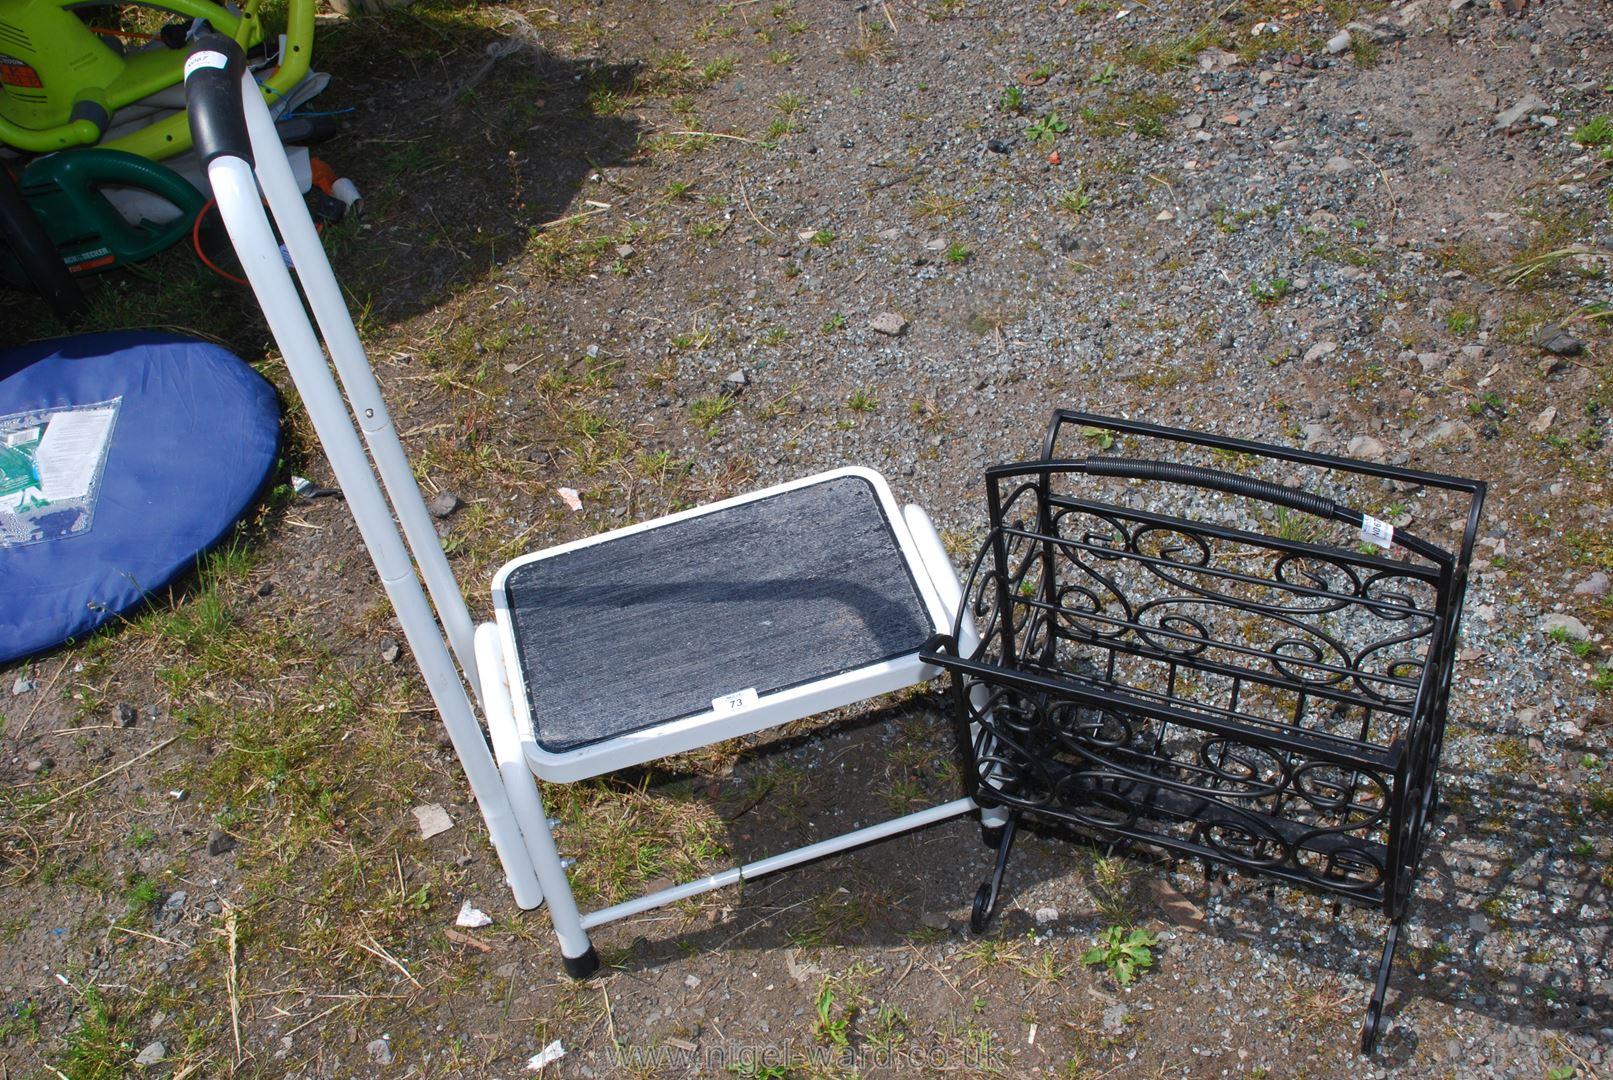 A handy stepper and a metal magazine rack.